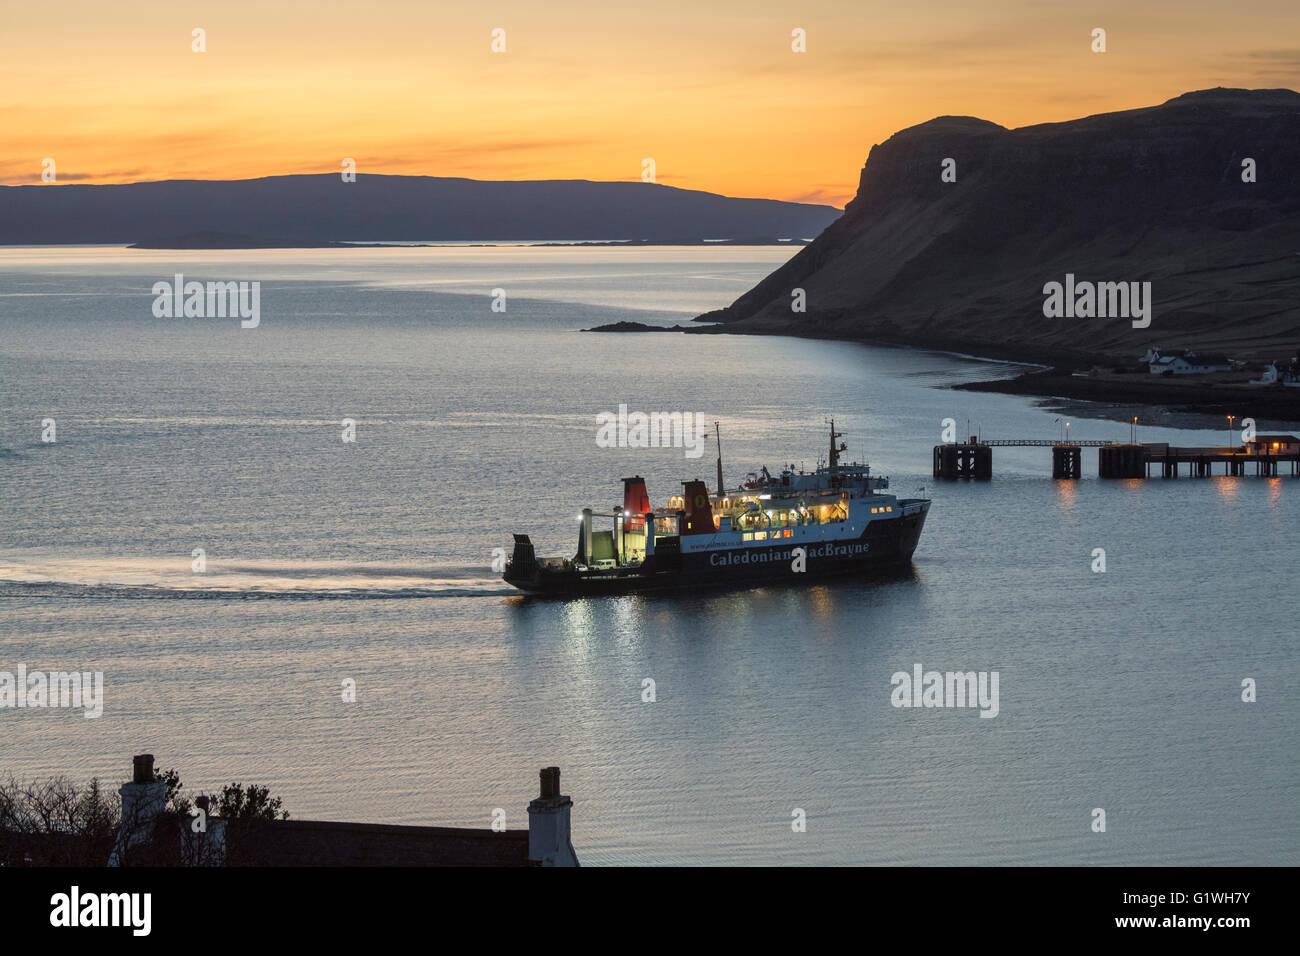 mv hebridean isles approaching uig harbour at sunset, skye - Stock Image